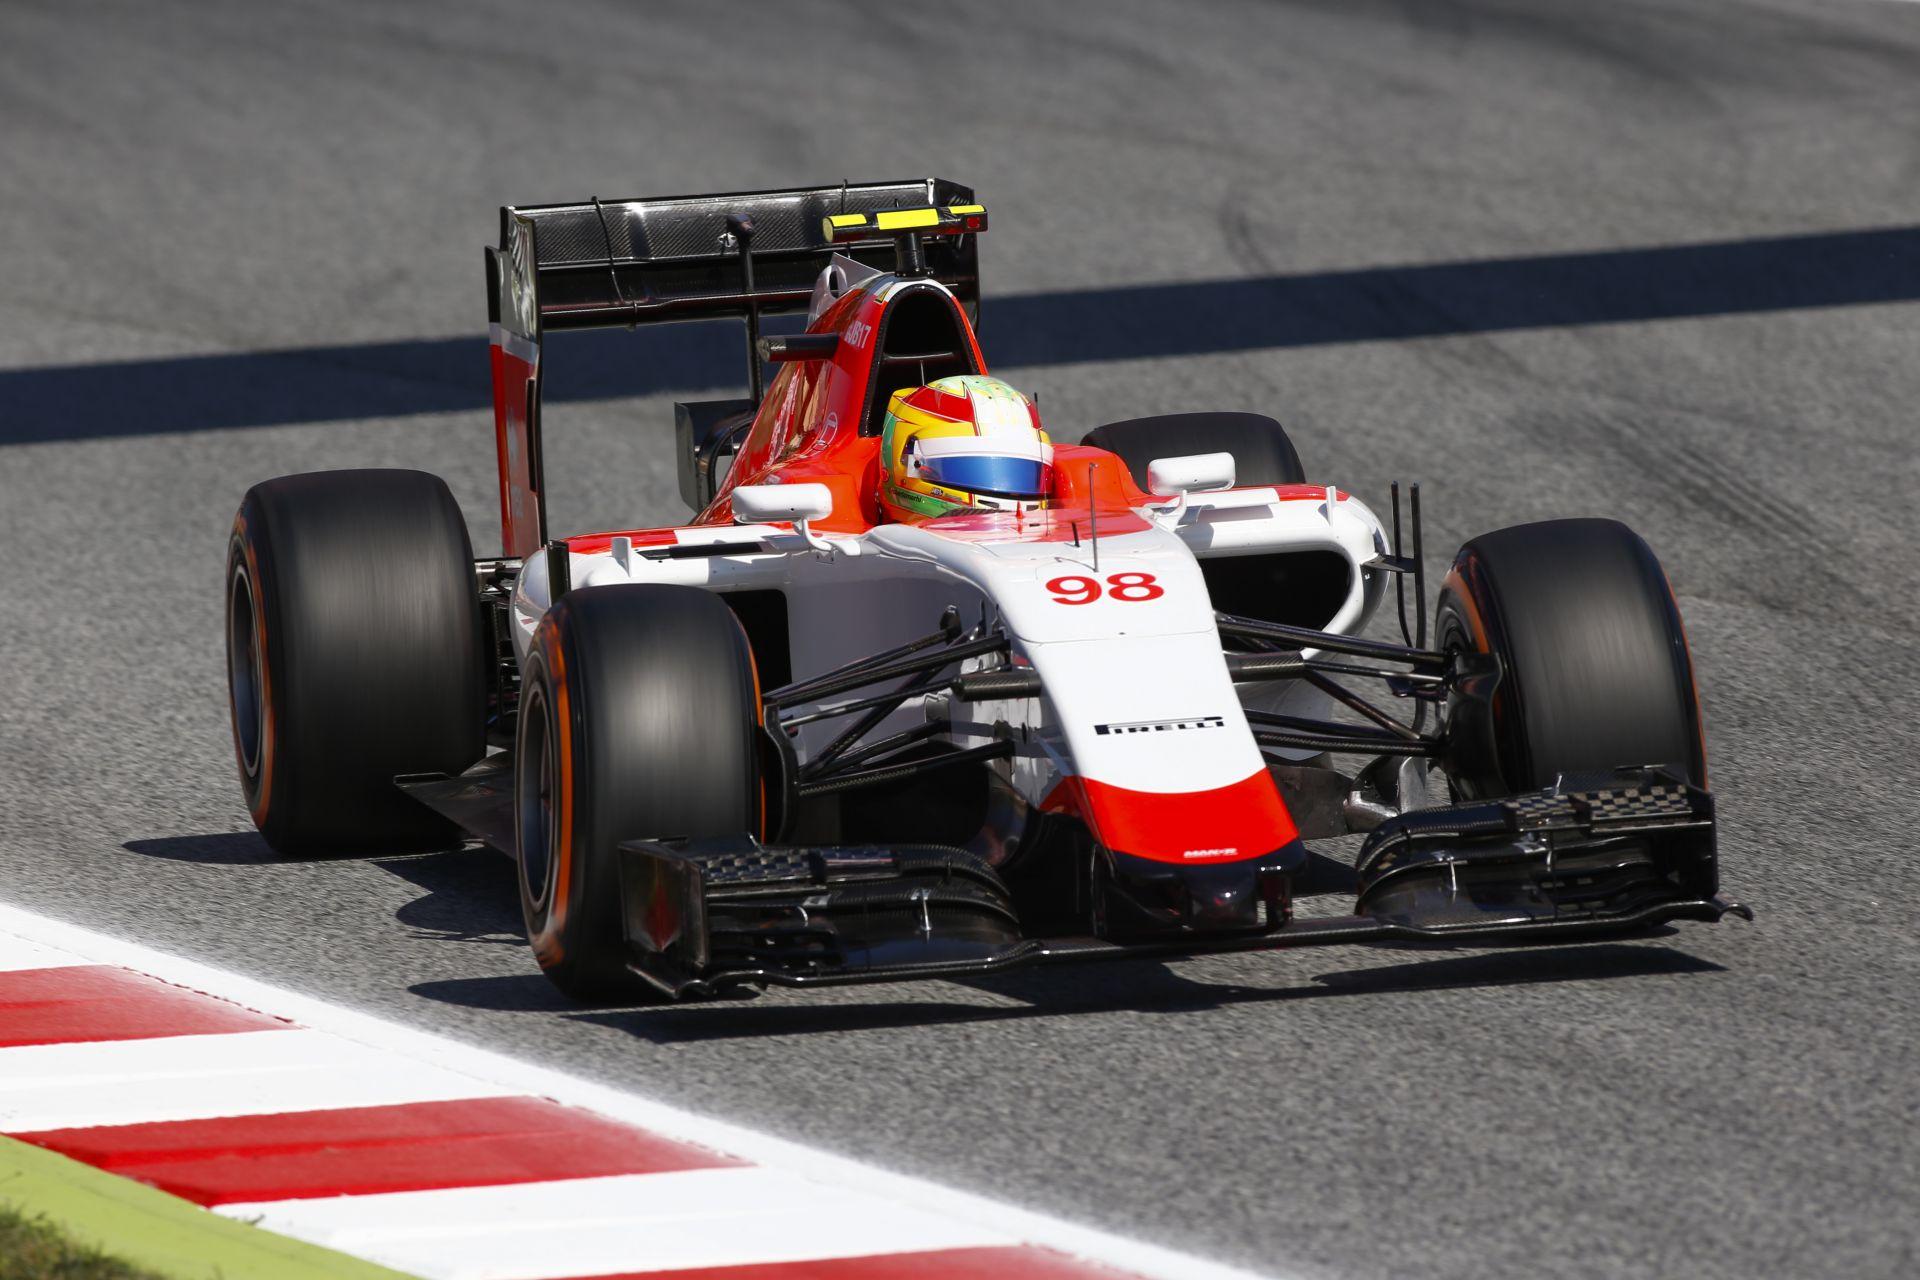 Tele lesz matricázva a Manor-Mercedes a Forma-1-ben?